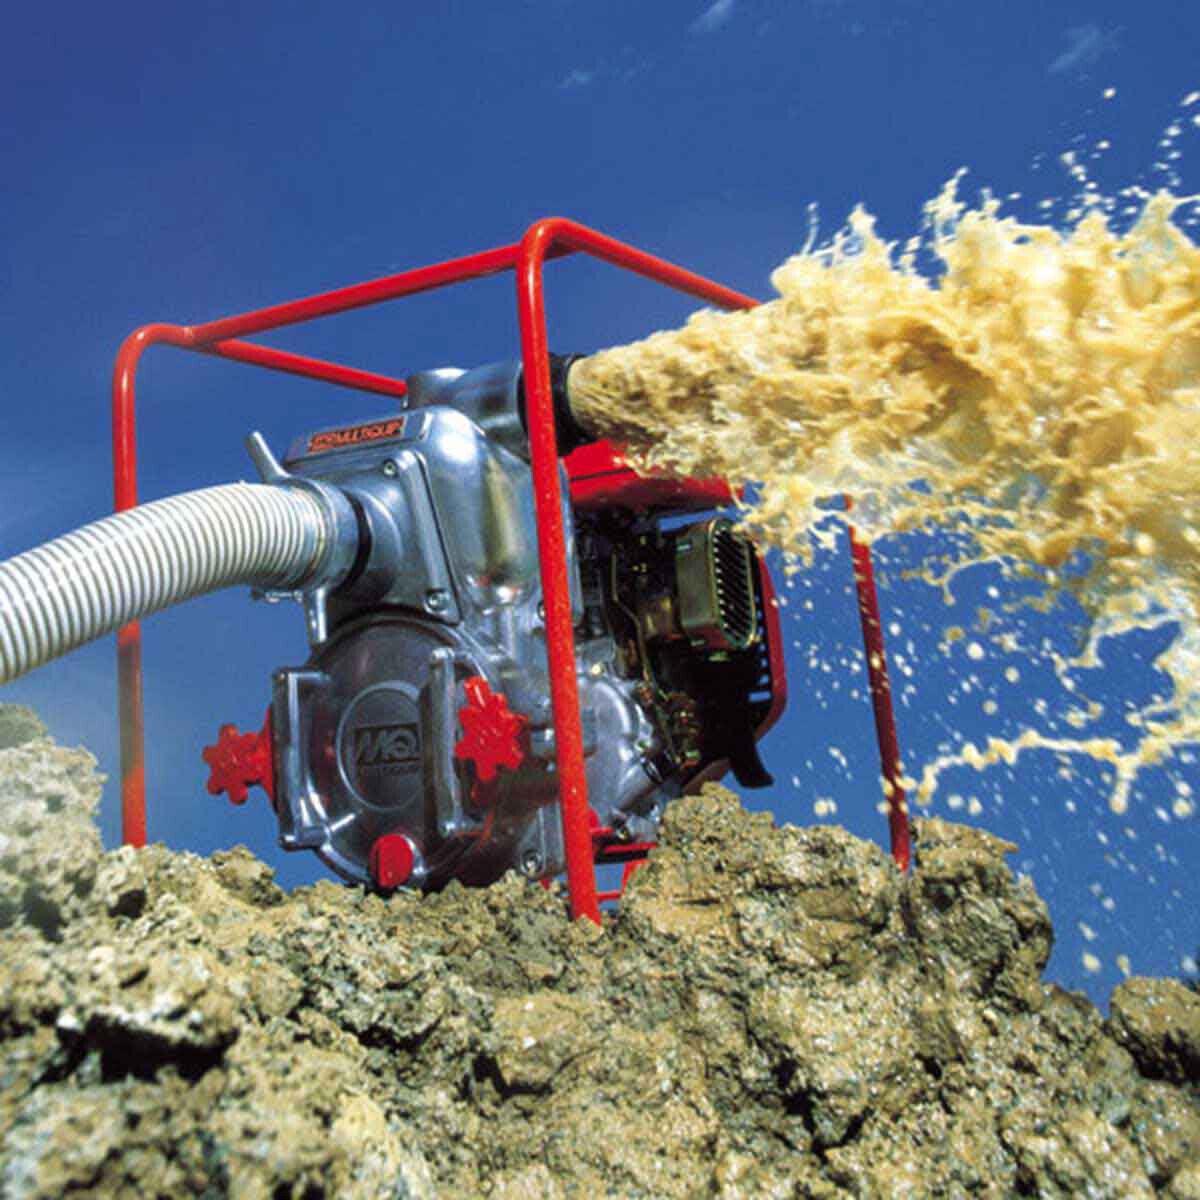 Multiquip QP3TH Pumping Water